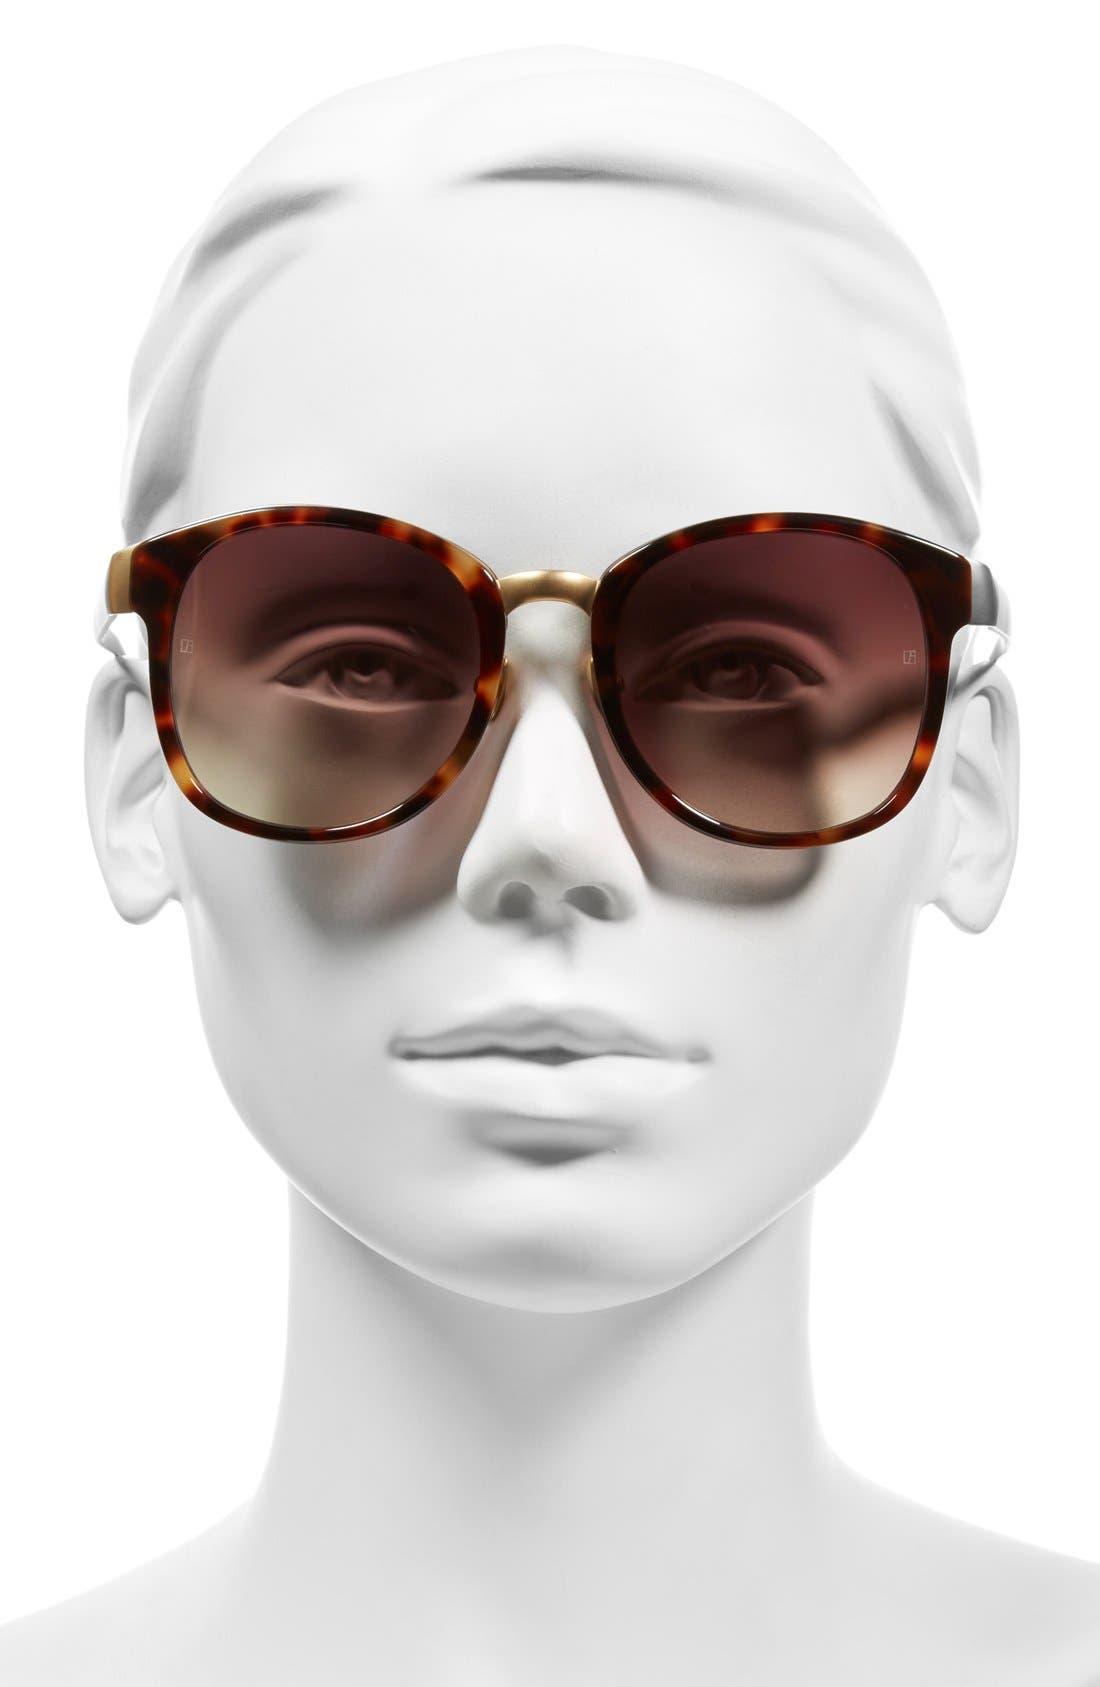 D-Frame 52mm 24 Karat Gold Trim Sunglasses,                             Alternate thumbnail 2, color,                             Tortoise/ Brown Grad